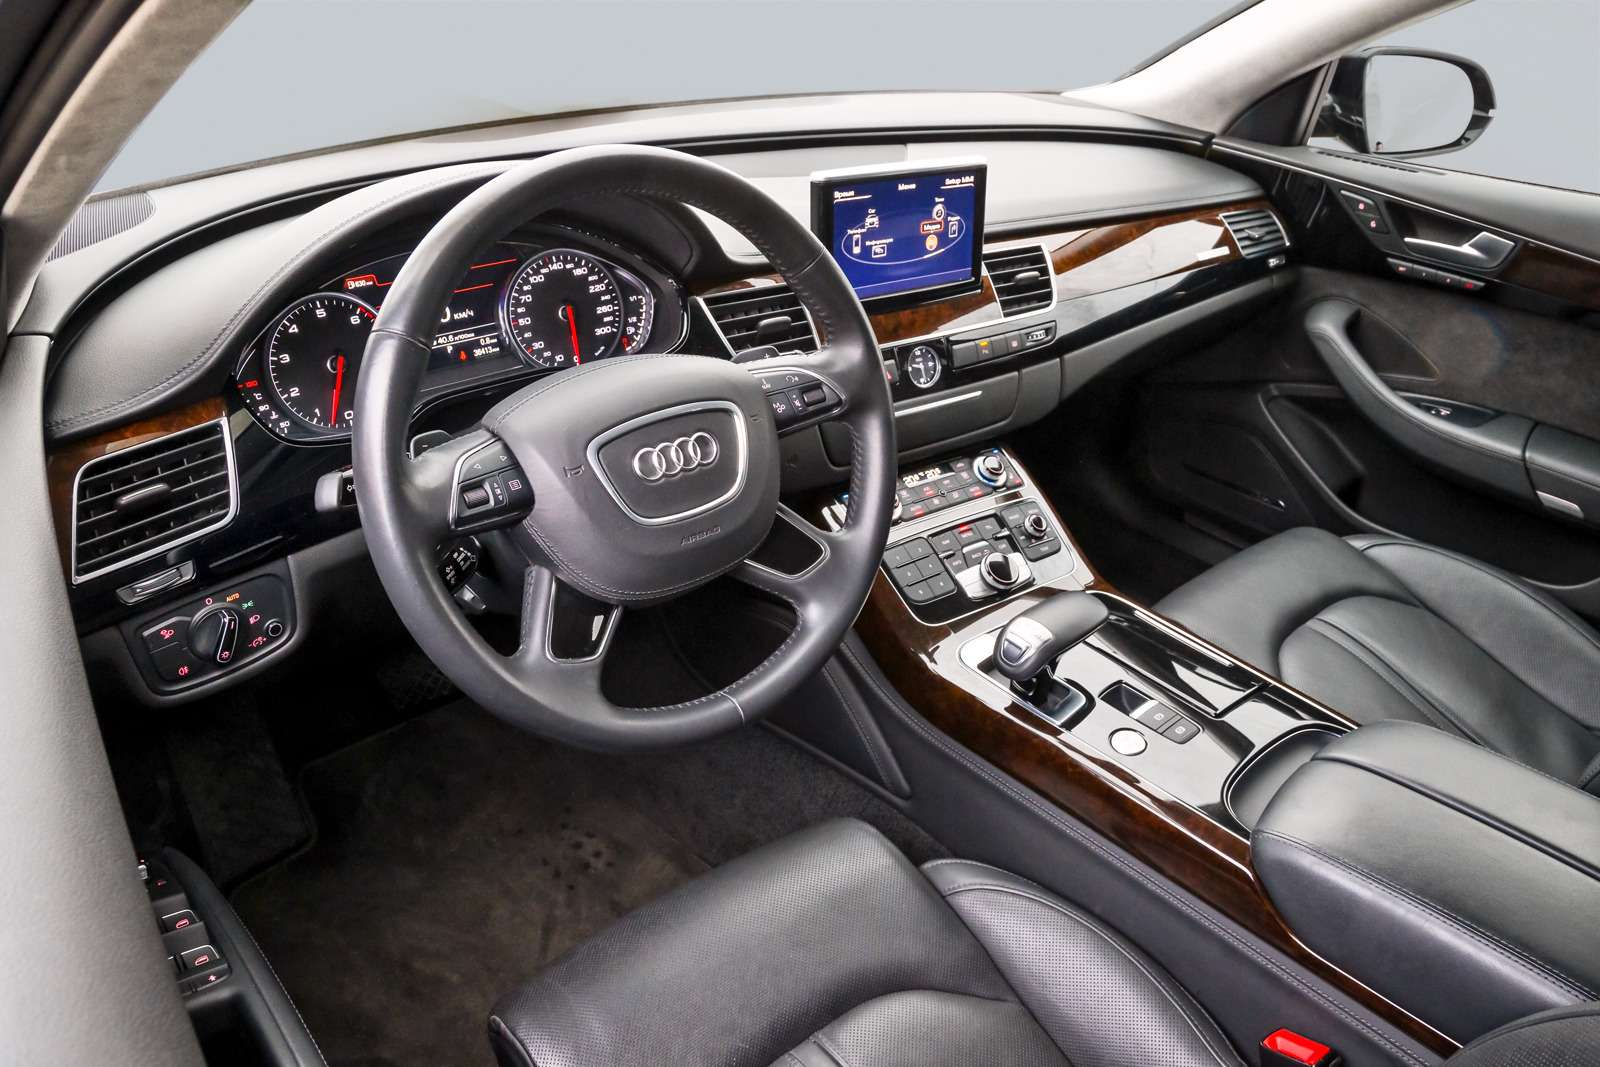 02-Audi_zr-01_16